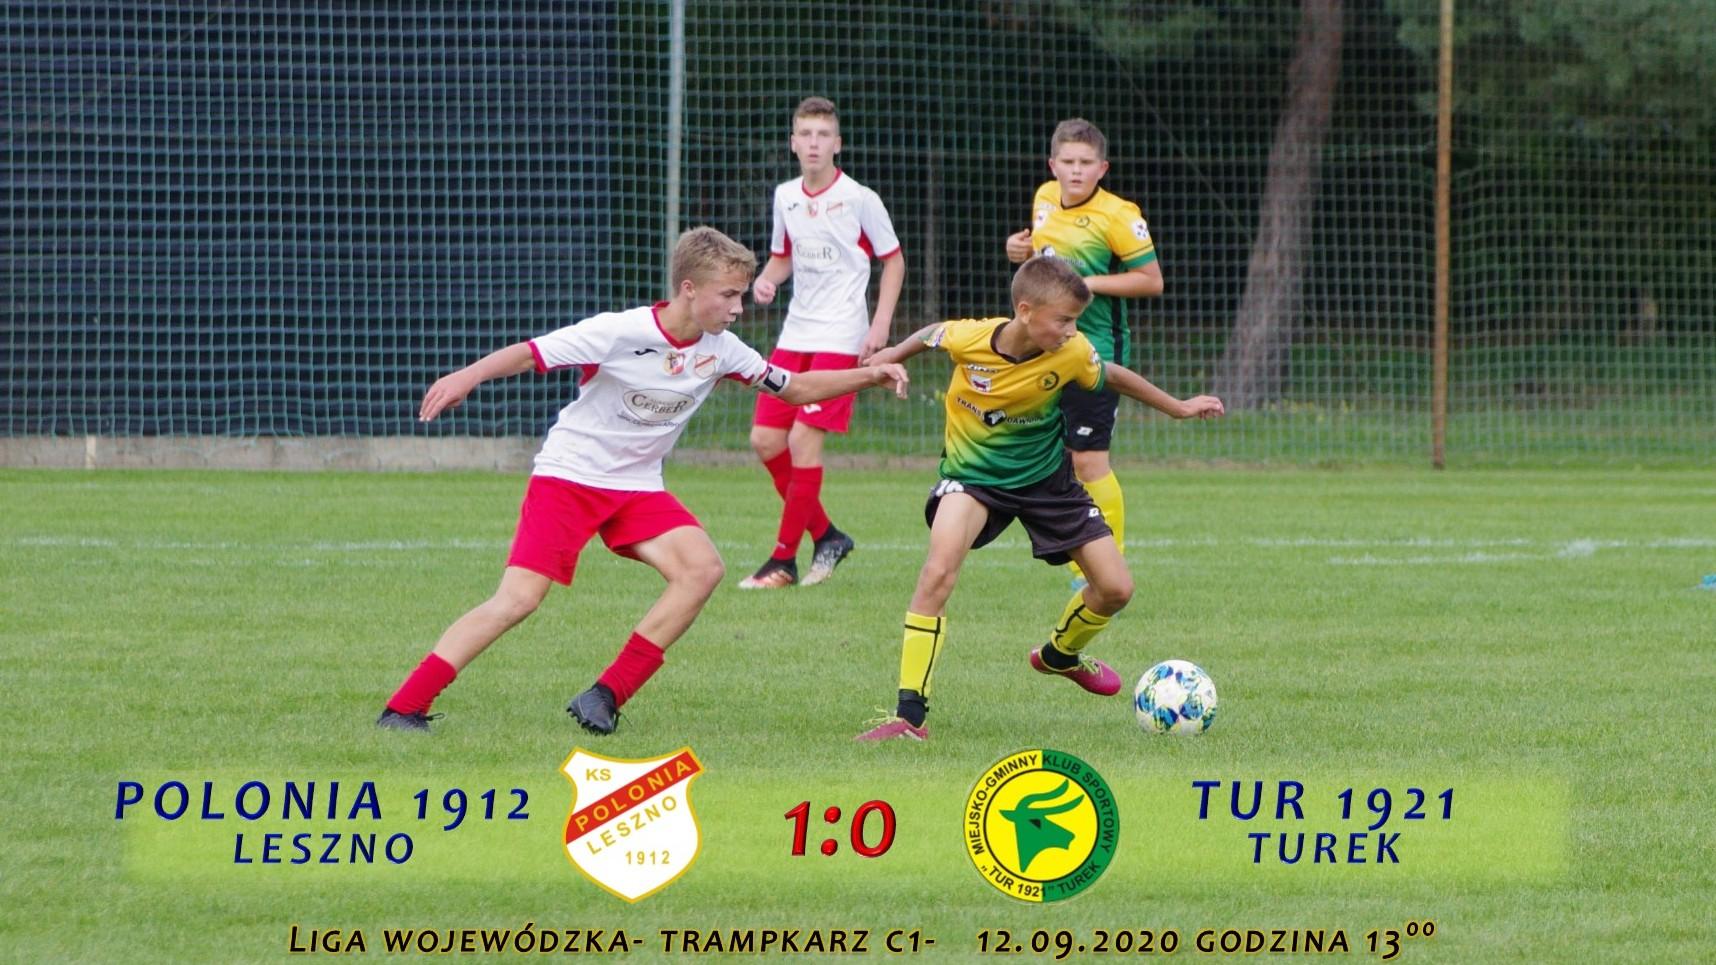 Polonia 1912 Leszno- Tur 1921 Turek 1:0, C1